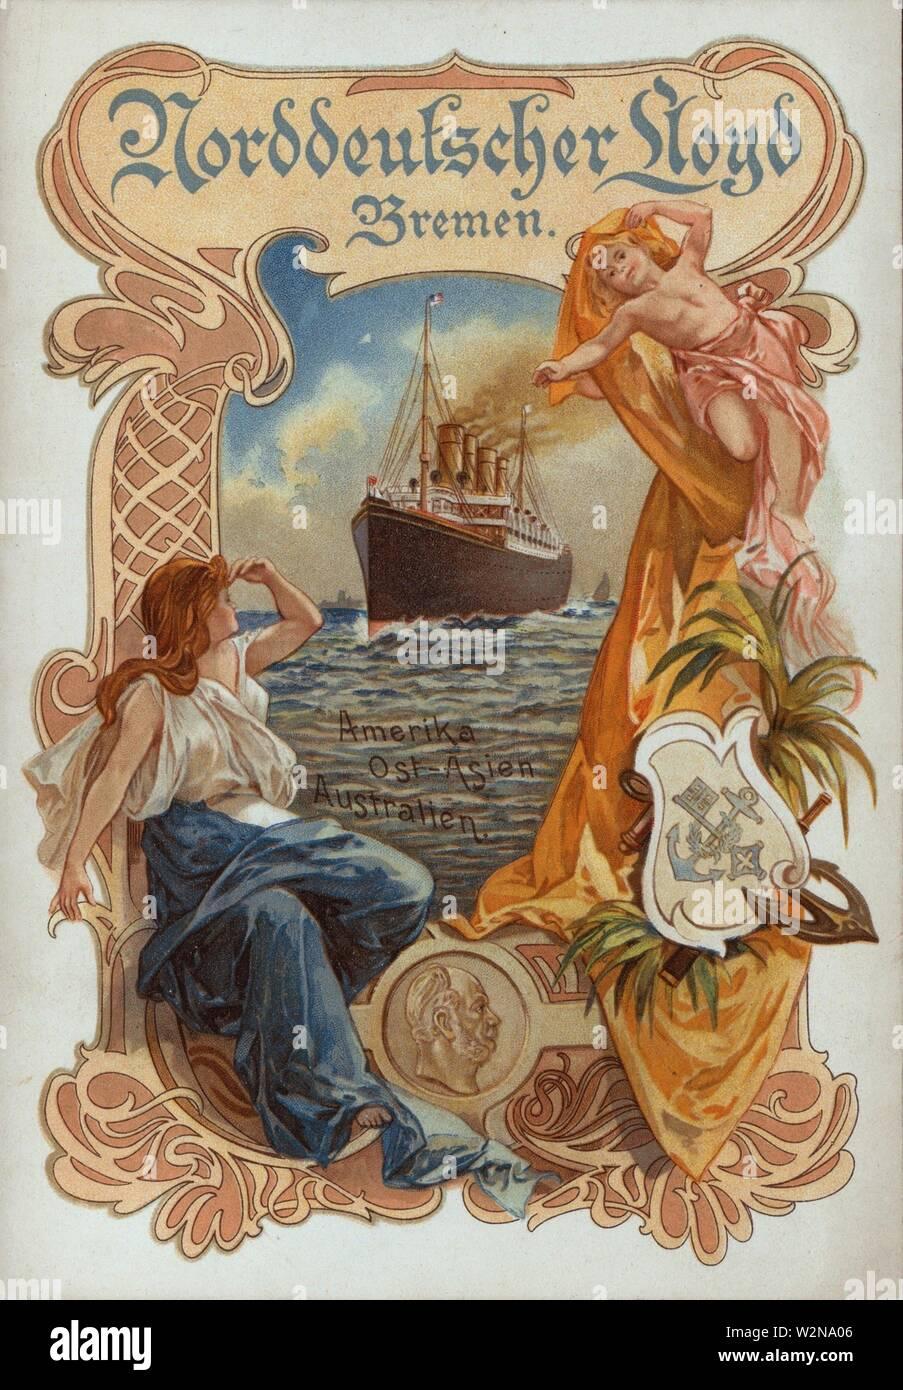 DINNER MENU [held by] NORDDEUTSCHER LLOYD BREMEN [at] ''S.S. ''KAISER WILHELM DER GROSSE'''' (SS;). Buttolph, Frank, 1850-1924 (Collector). The - Stock Image